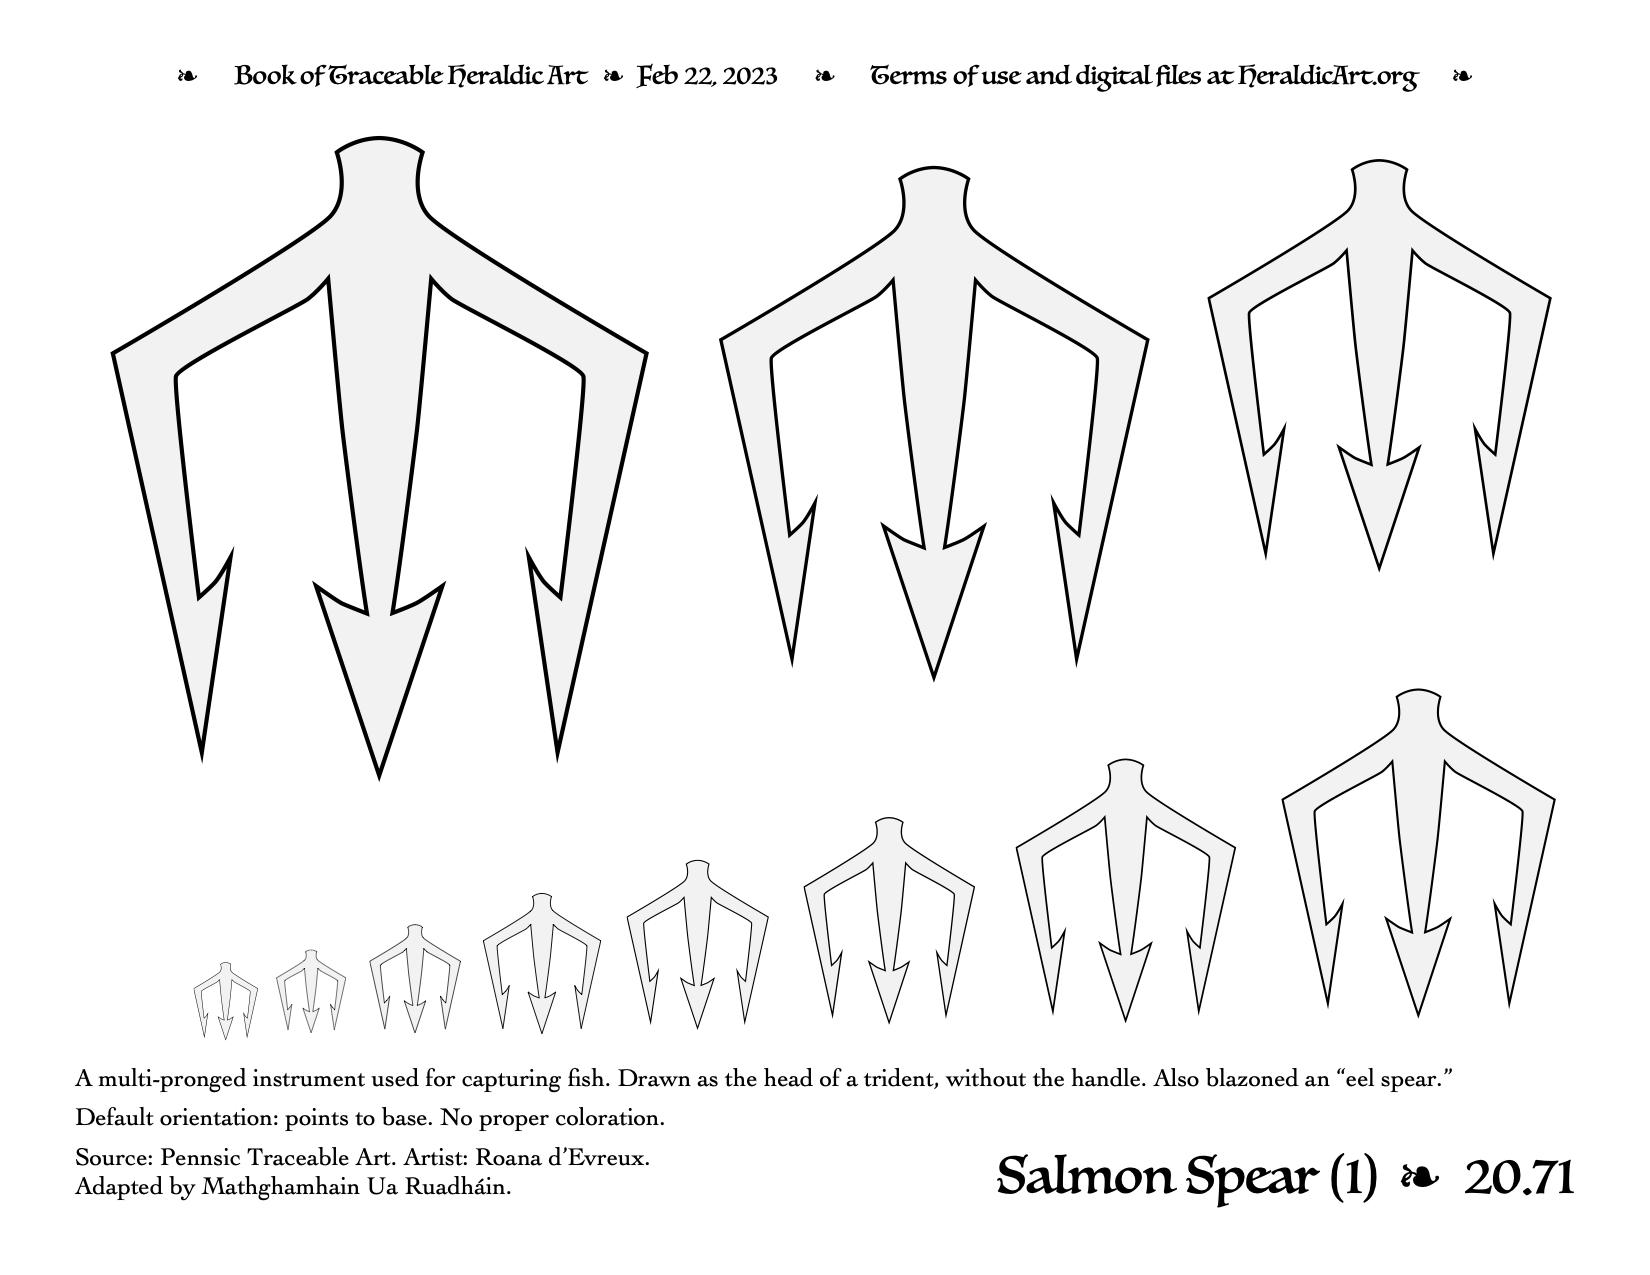 Salmon Spear - Traceable Heraldic Art